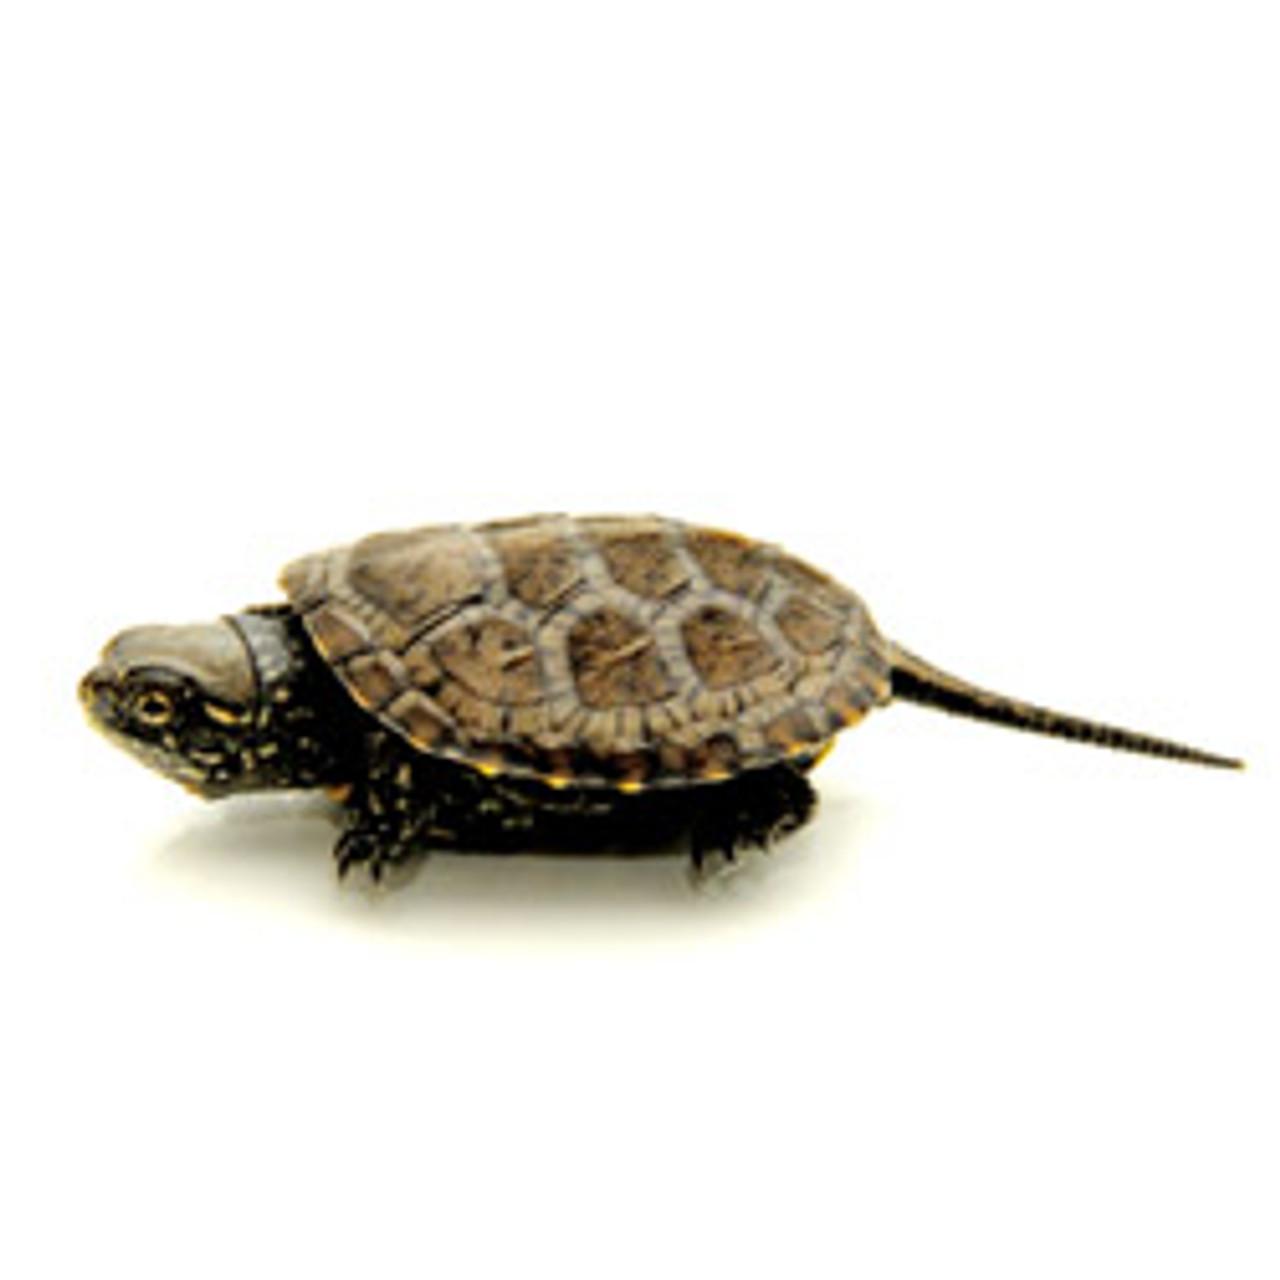 European Pond Turtle (Emys obicularis)